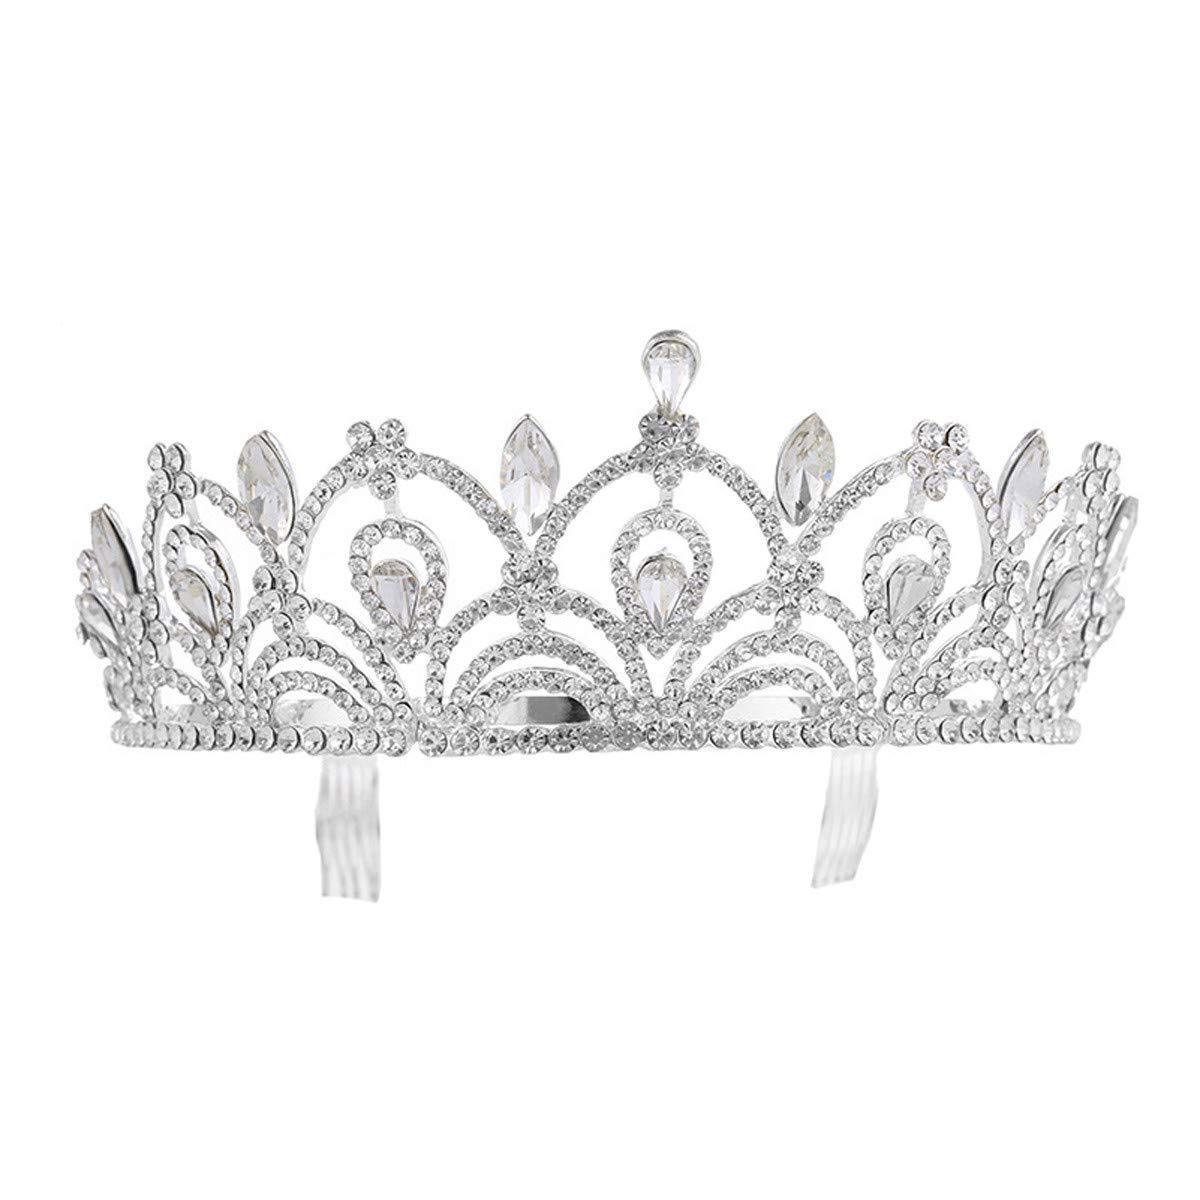 Crystal Crown, Bridal Wedding/Prom Hair Pins/Headdress Accessories/Party/Girls Bridal Ornaments Korean Diamond Wedding Crown Diamond Zinc Alloy Headwear (Color : Silvery)